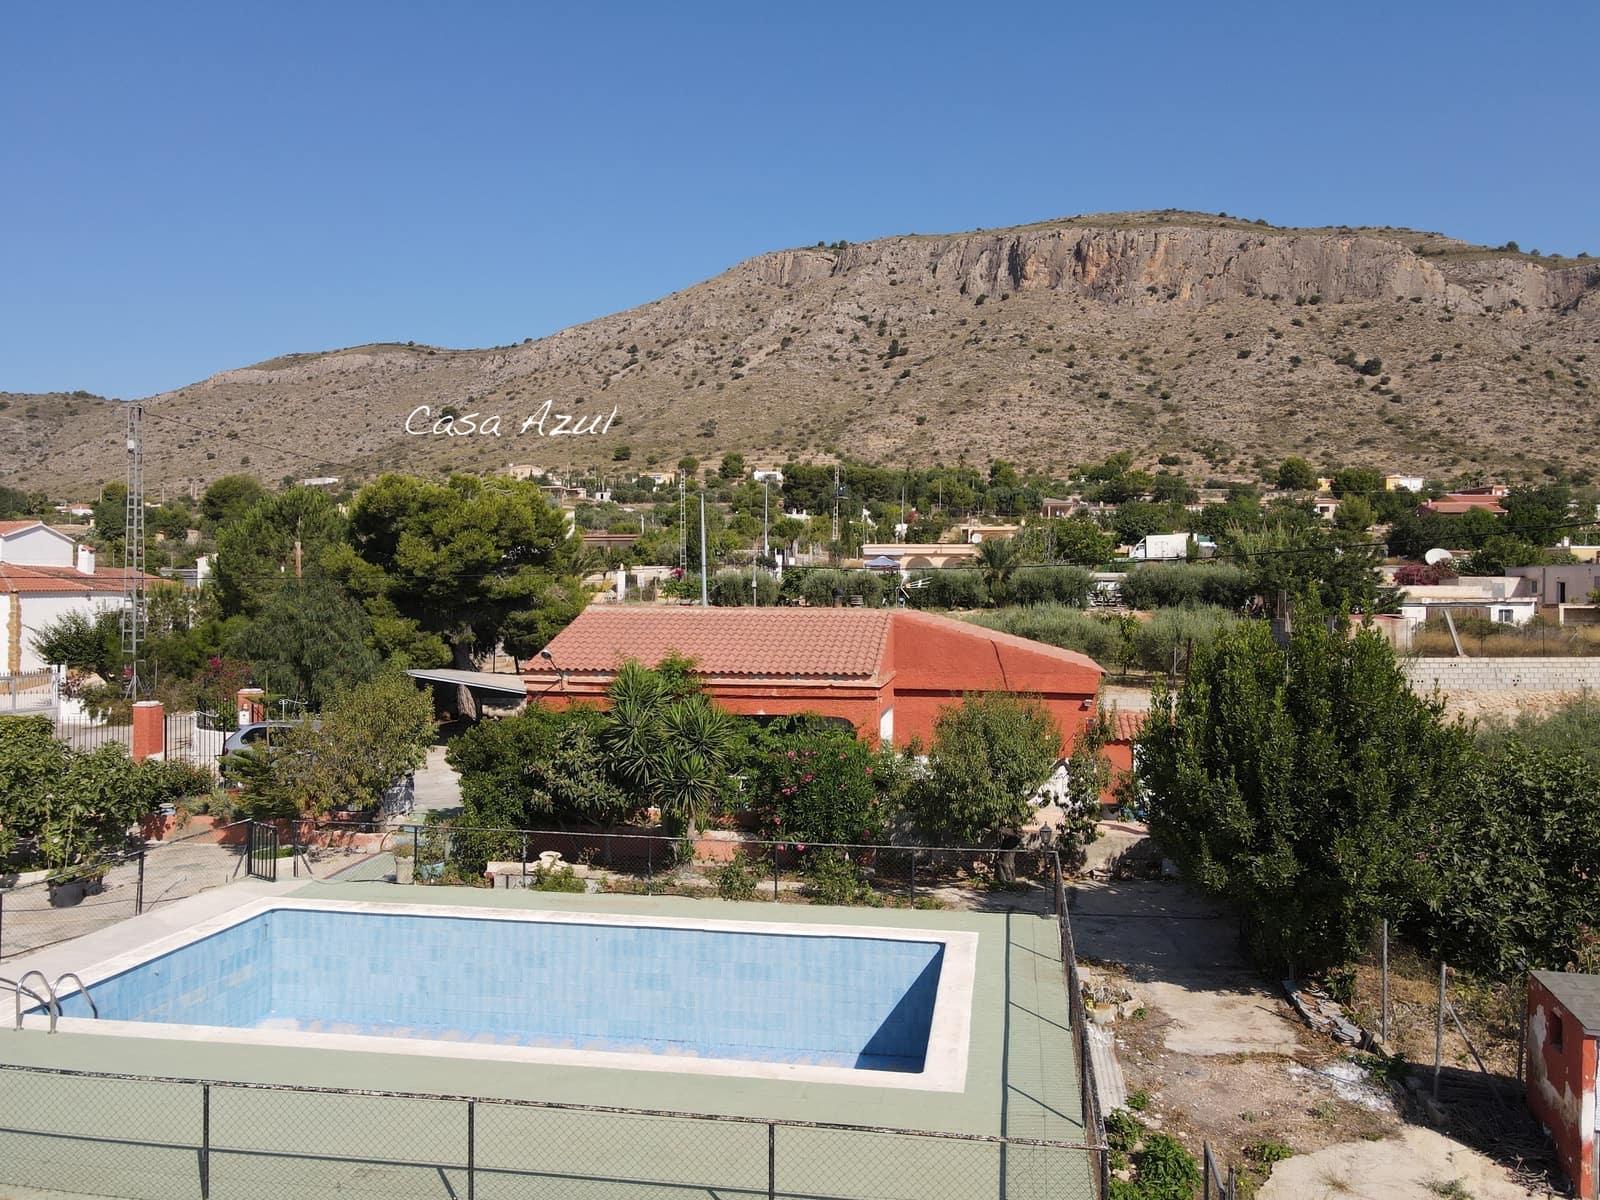 4 bedroom Finca/Country House for sale in Hondon de las Nieves - € 120,000 (Ref: 6239123)